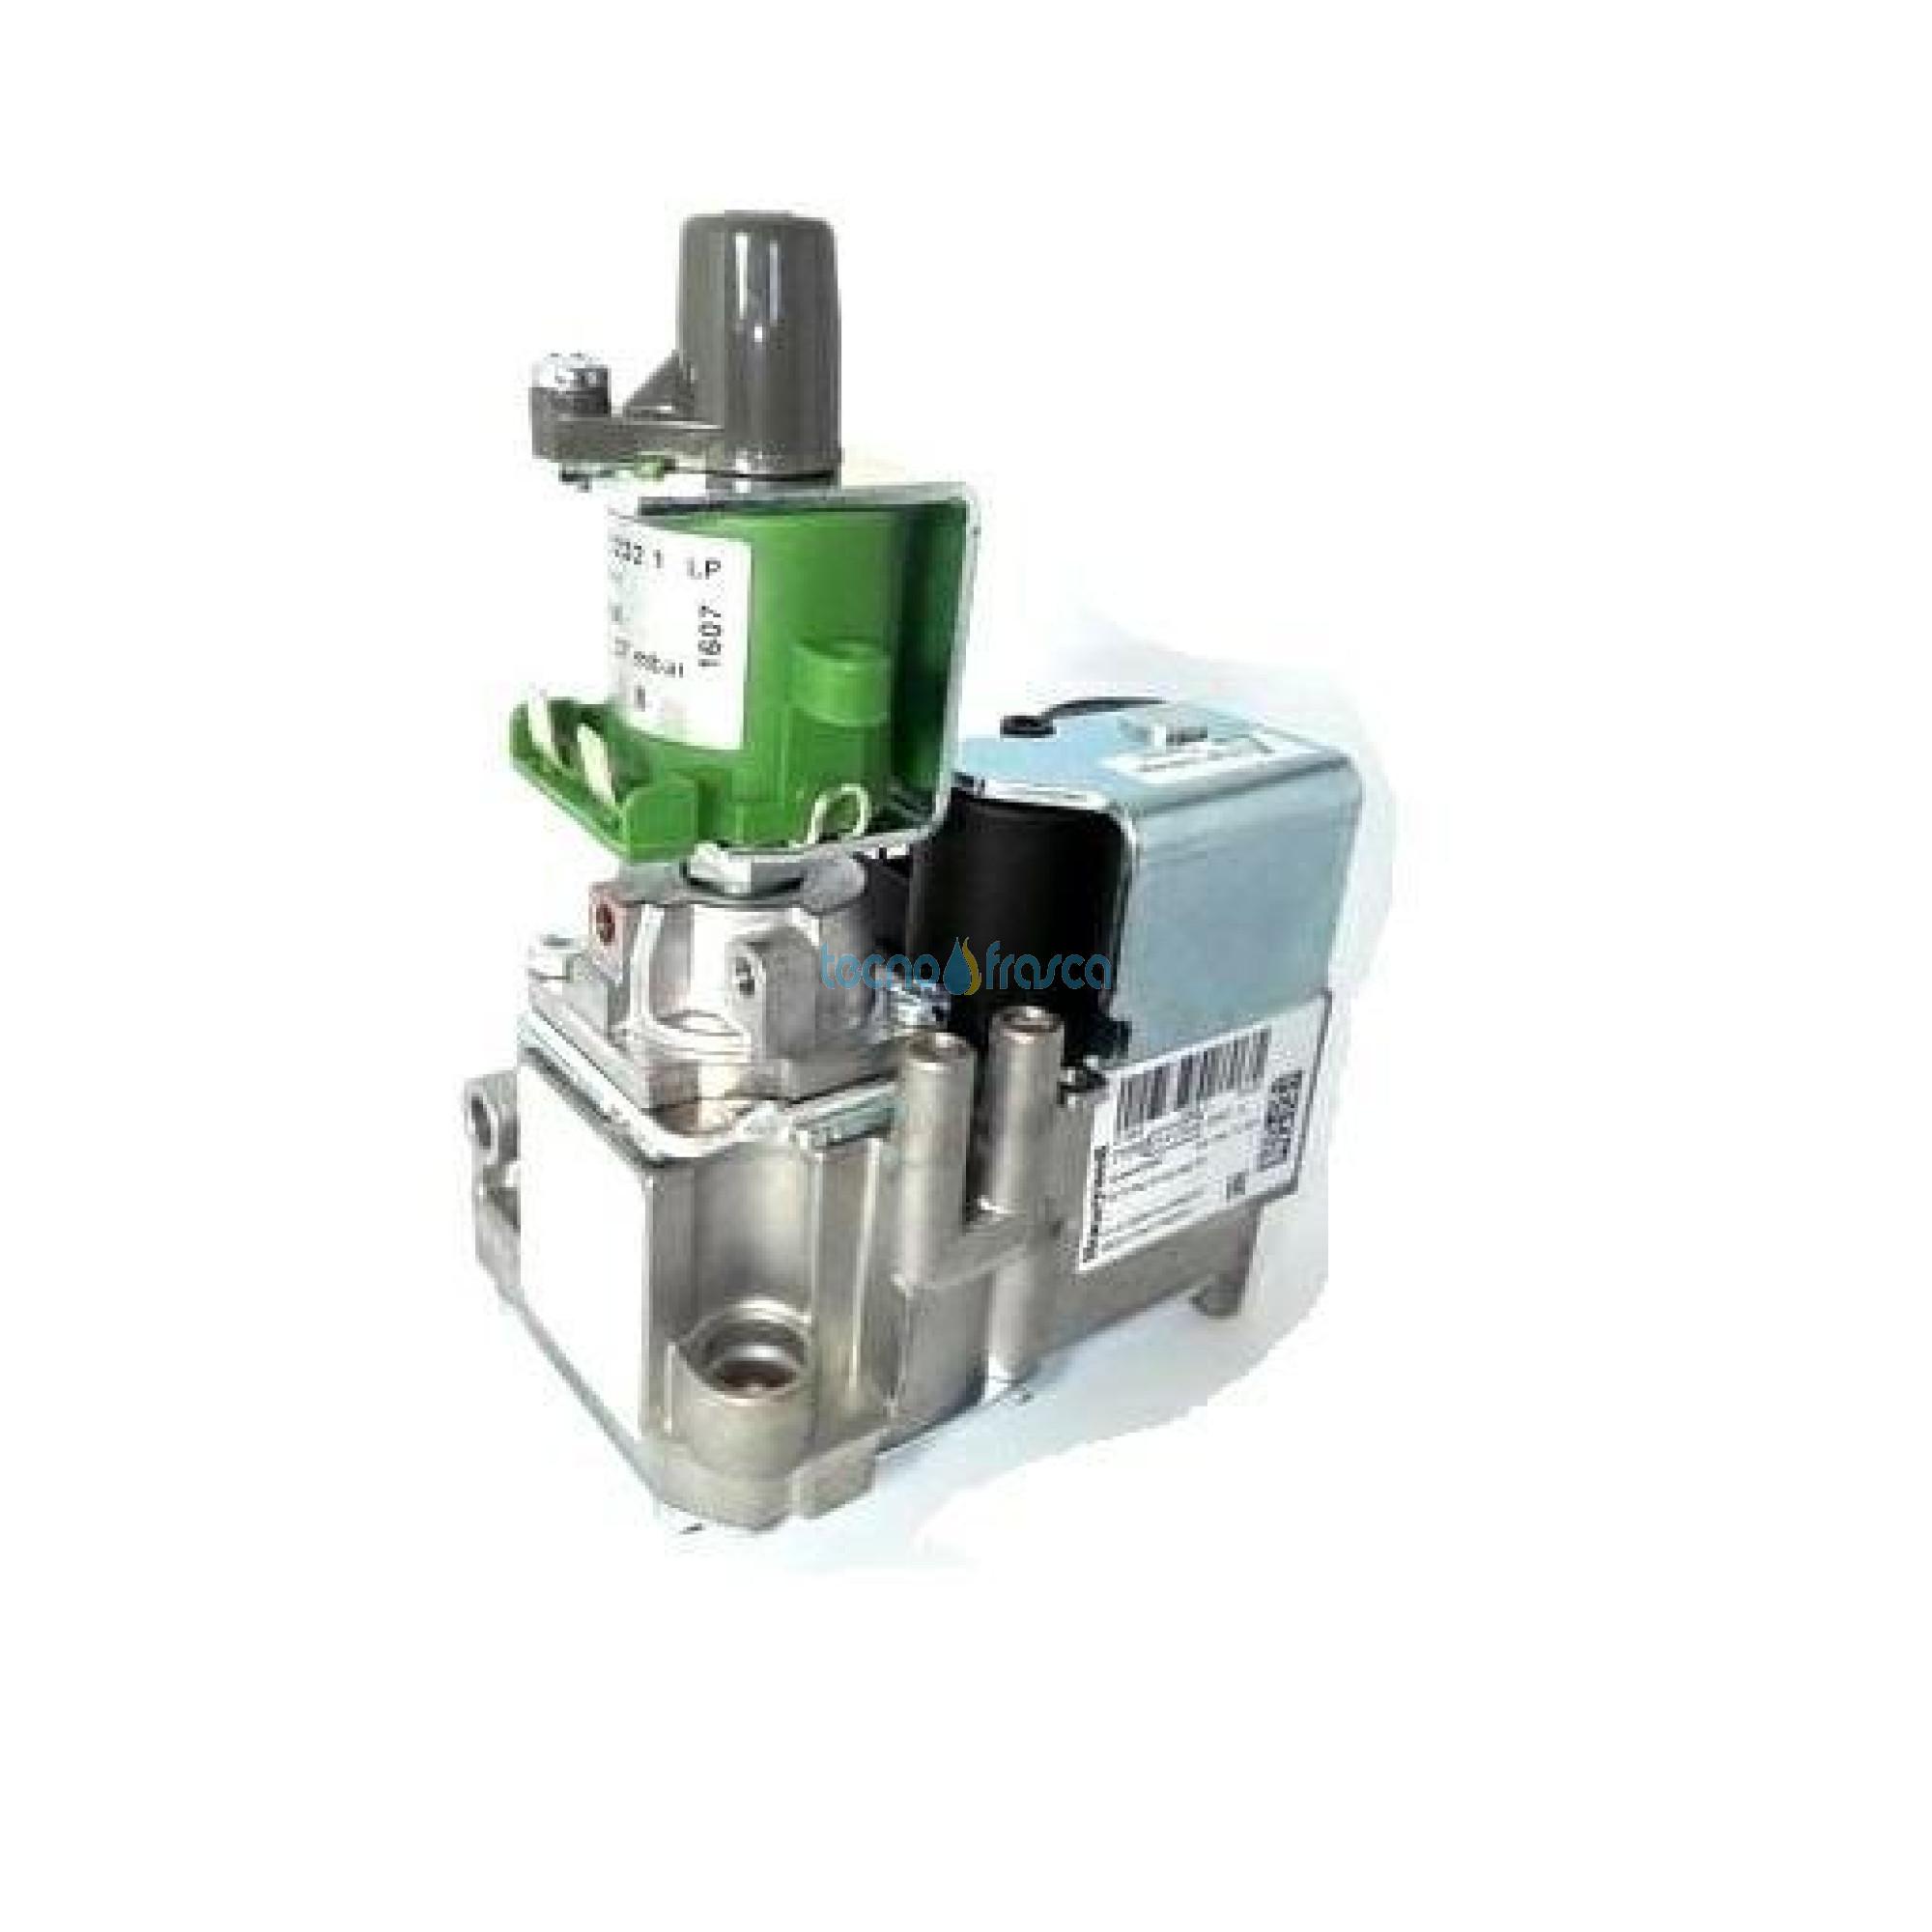 Valvola gas vk4105m2097 ariston saunier duval fonderie sime